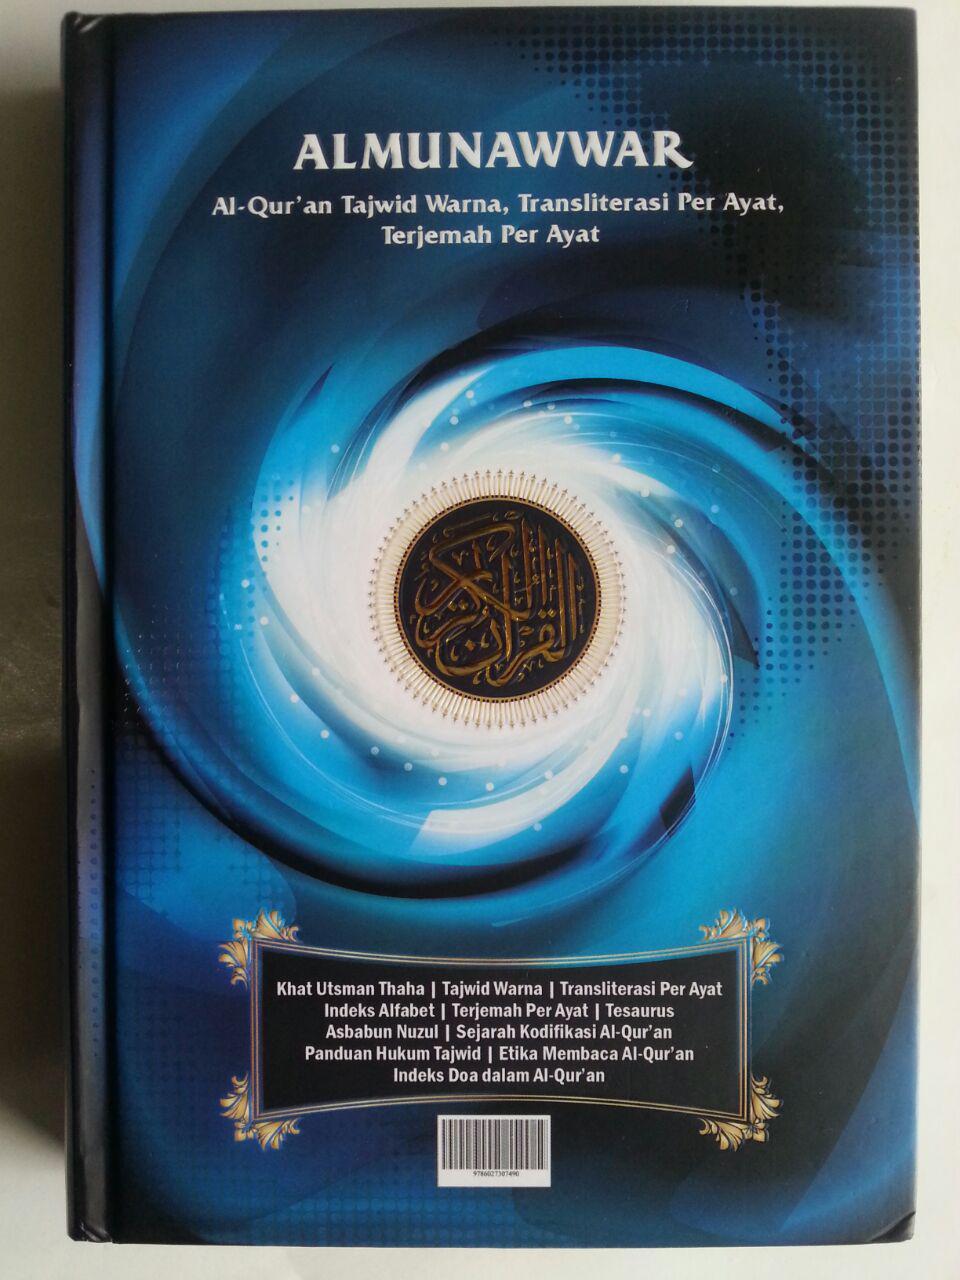 Al-Qur'an Almunawwar Tajwid Warna Transliterasi Terjemah Perayat A4 cover 2